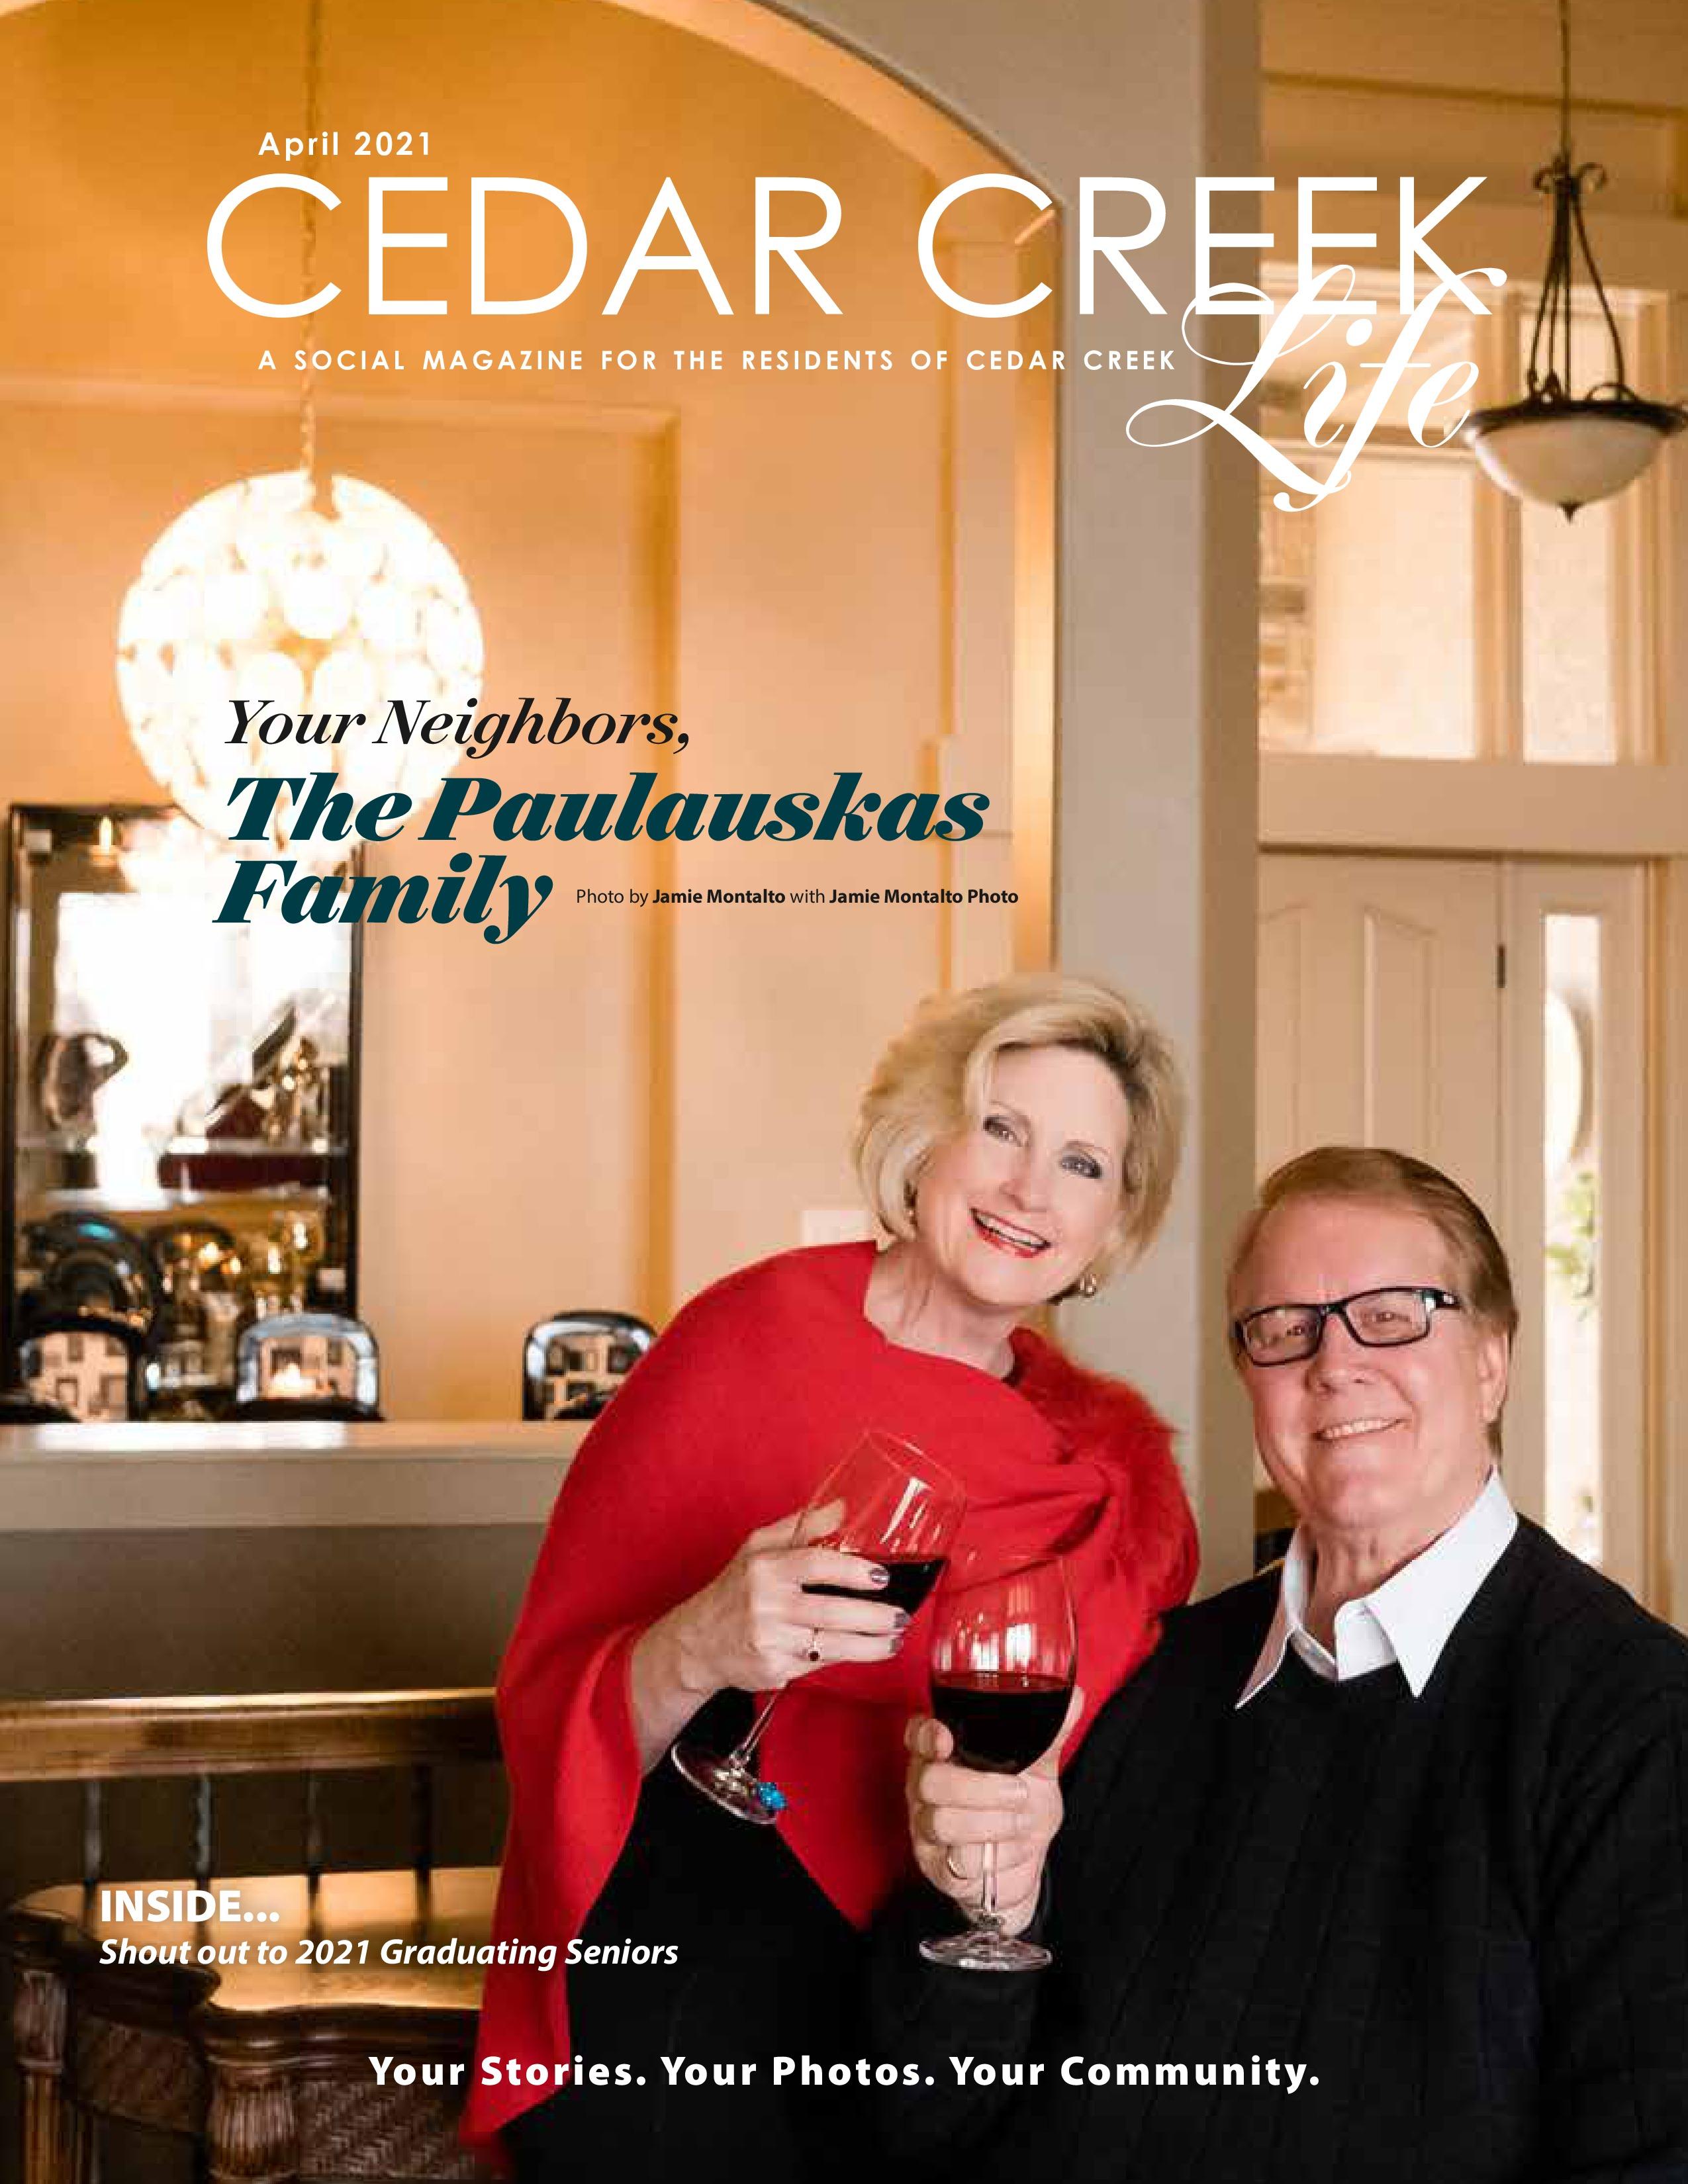 Cedar Creek Life 2021-04-01